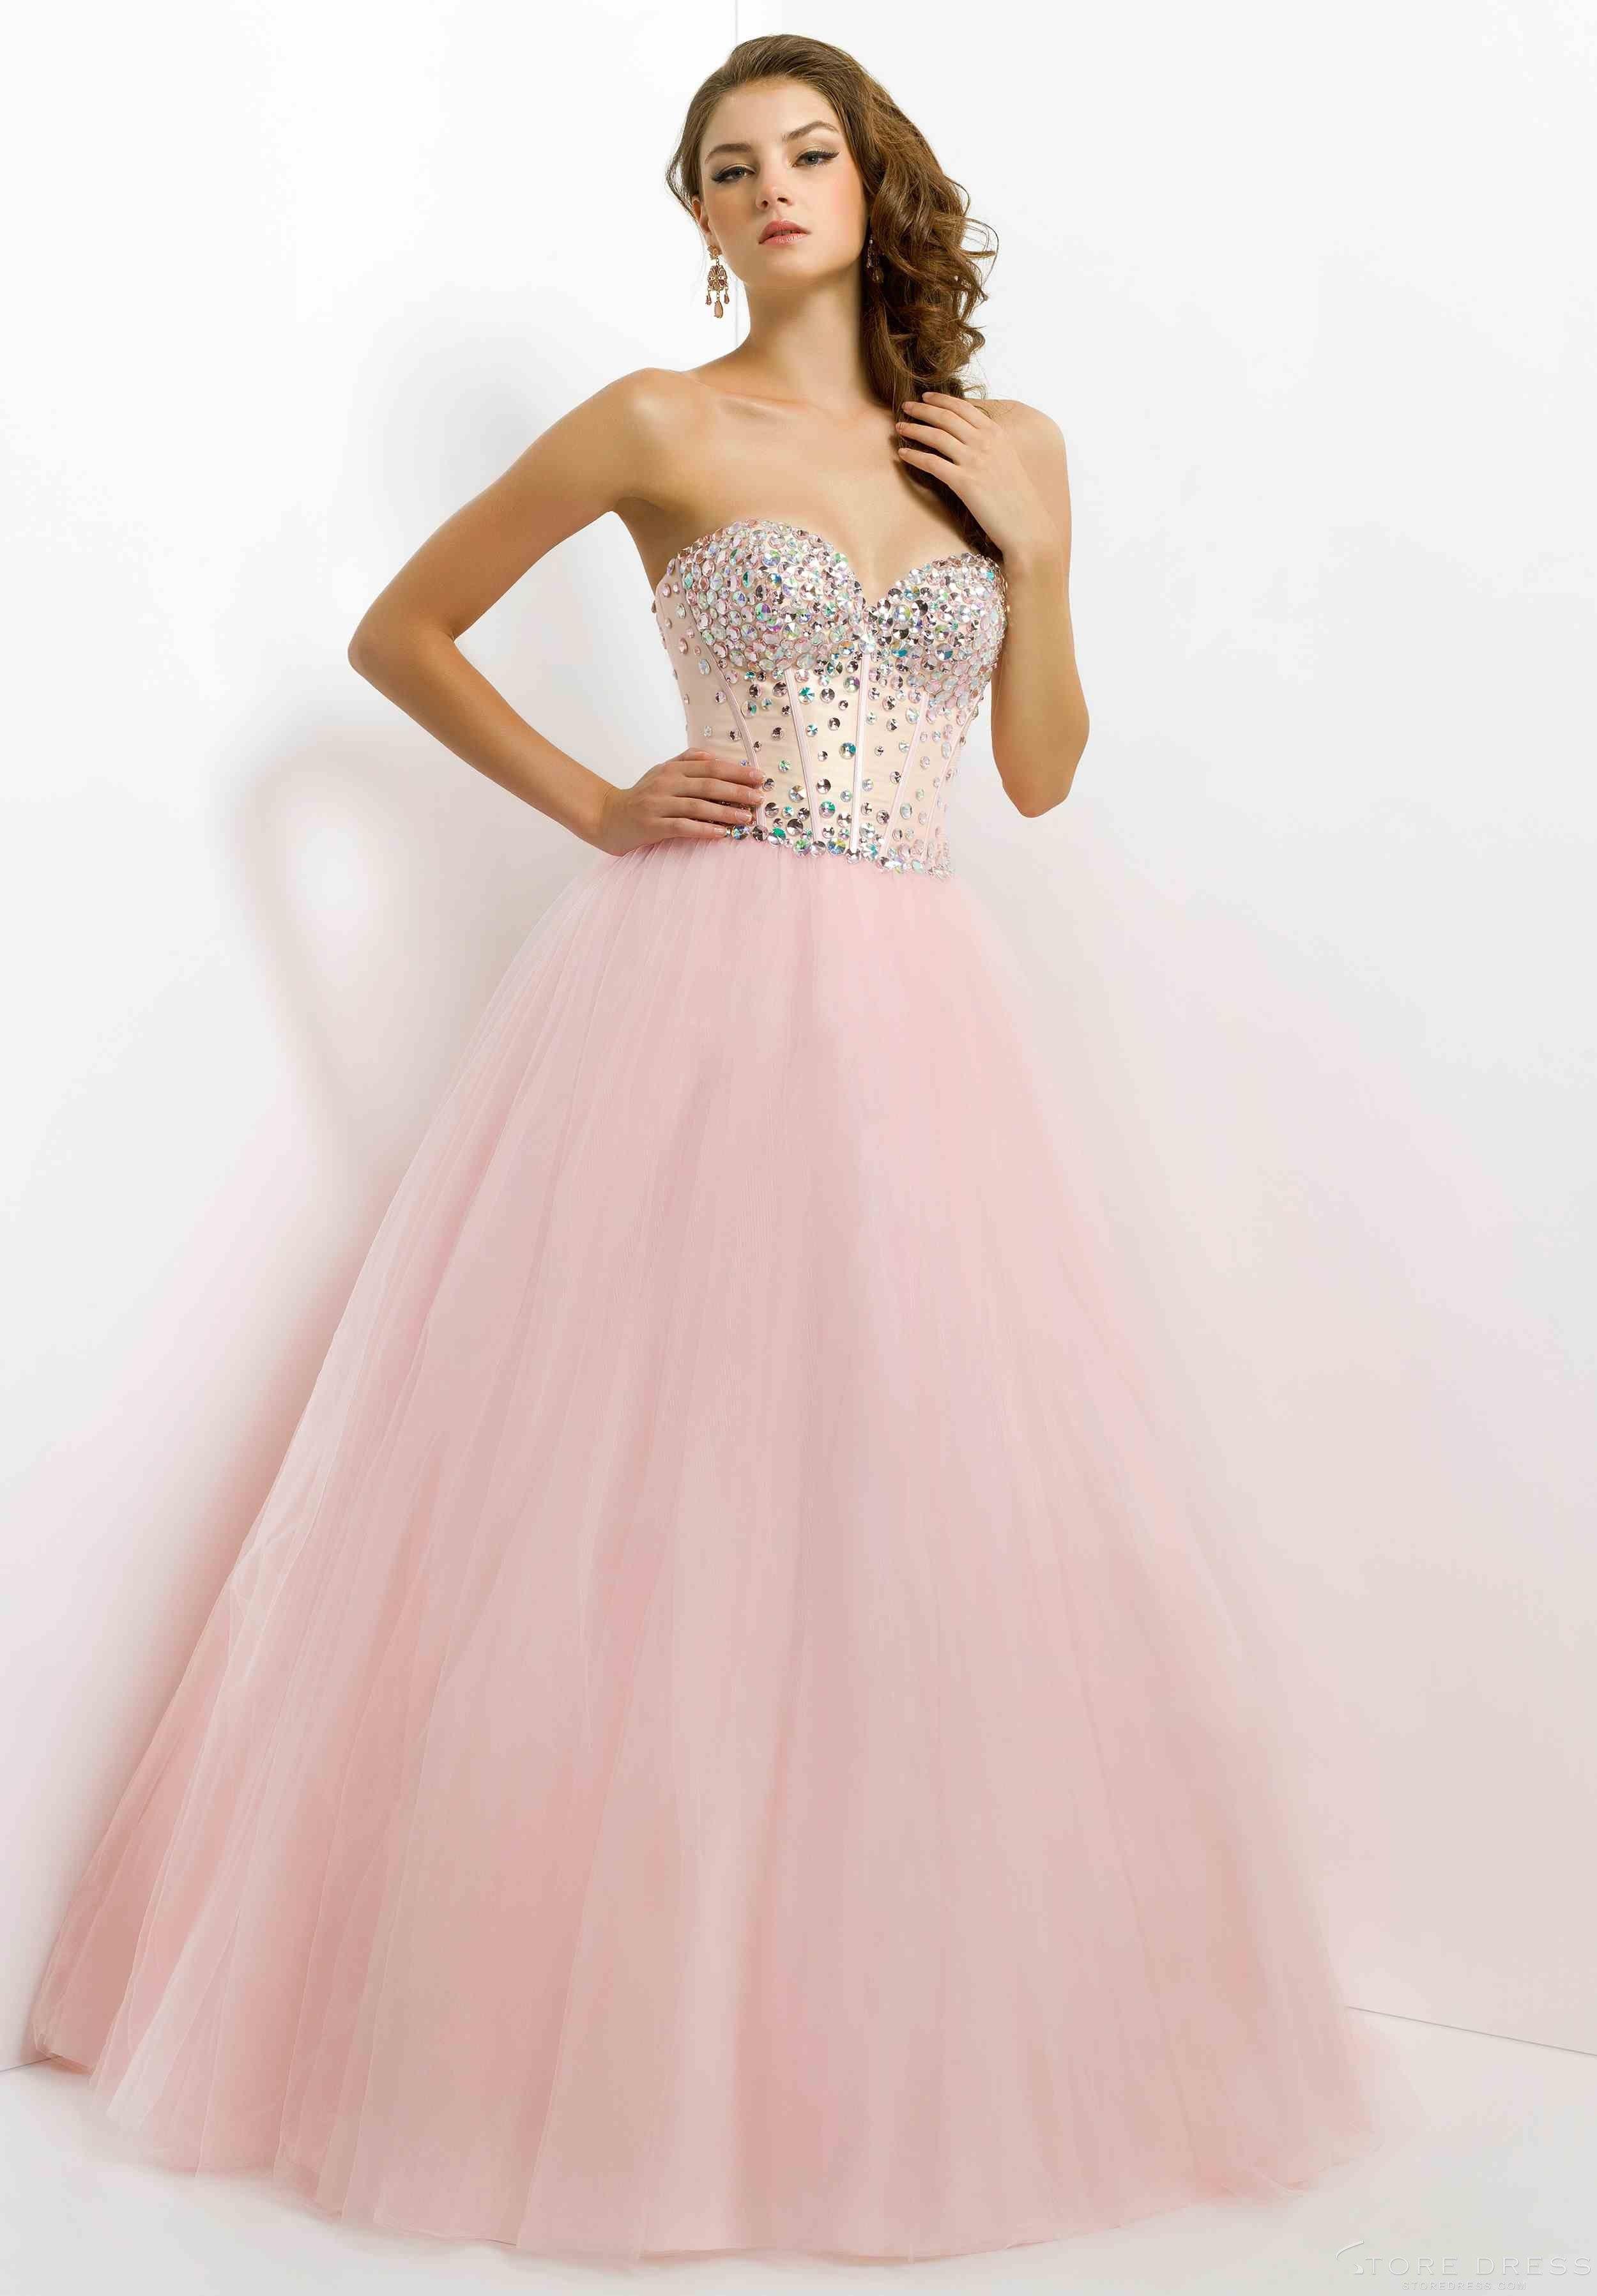 Mini A-line Sweetheart Sweep / Brush 2014 New Style Prom Dress - Promgirlshop.com on Wanelo